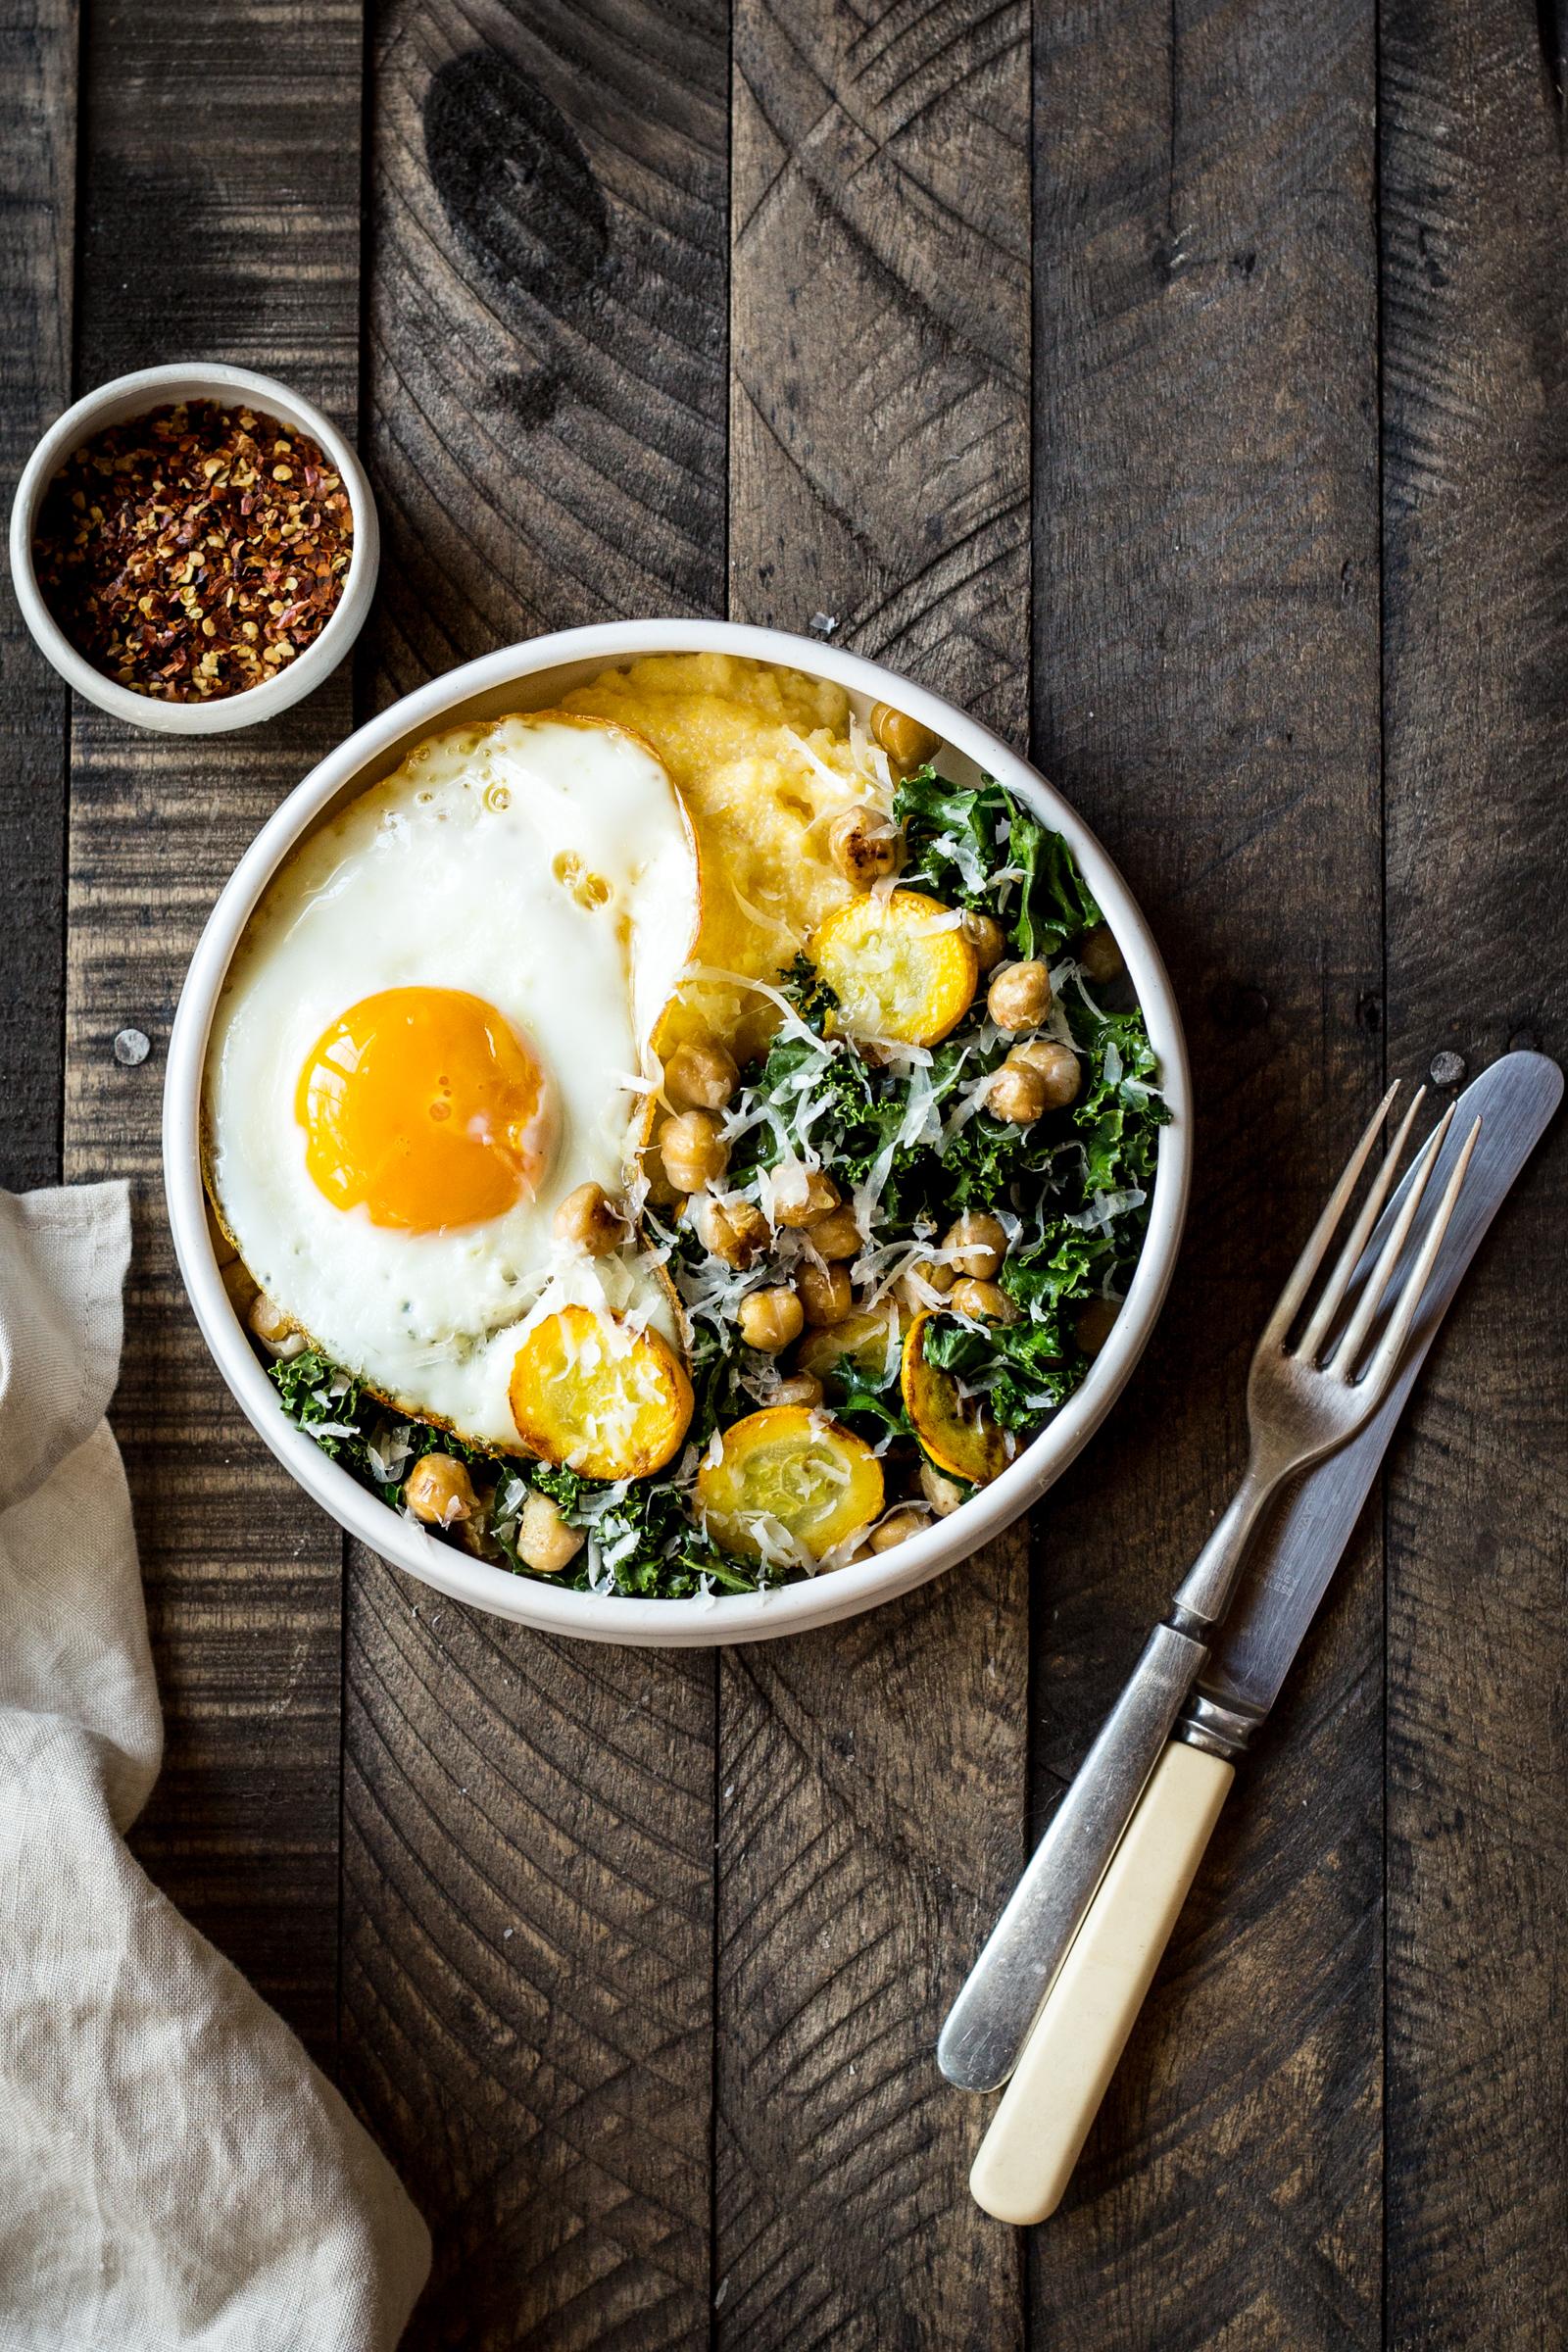 Polenta Bowls with Garlicky Summer Squash and Kale